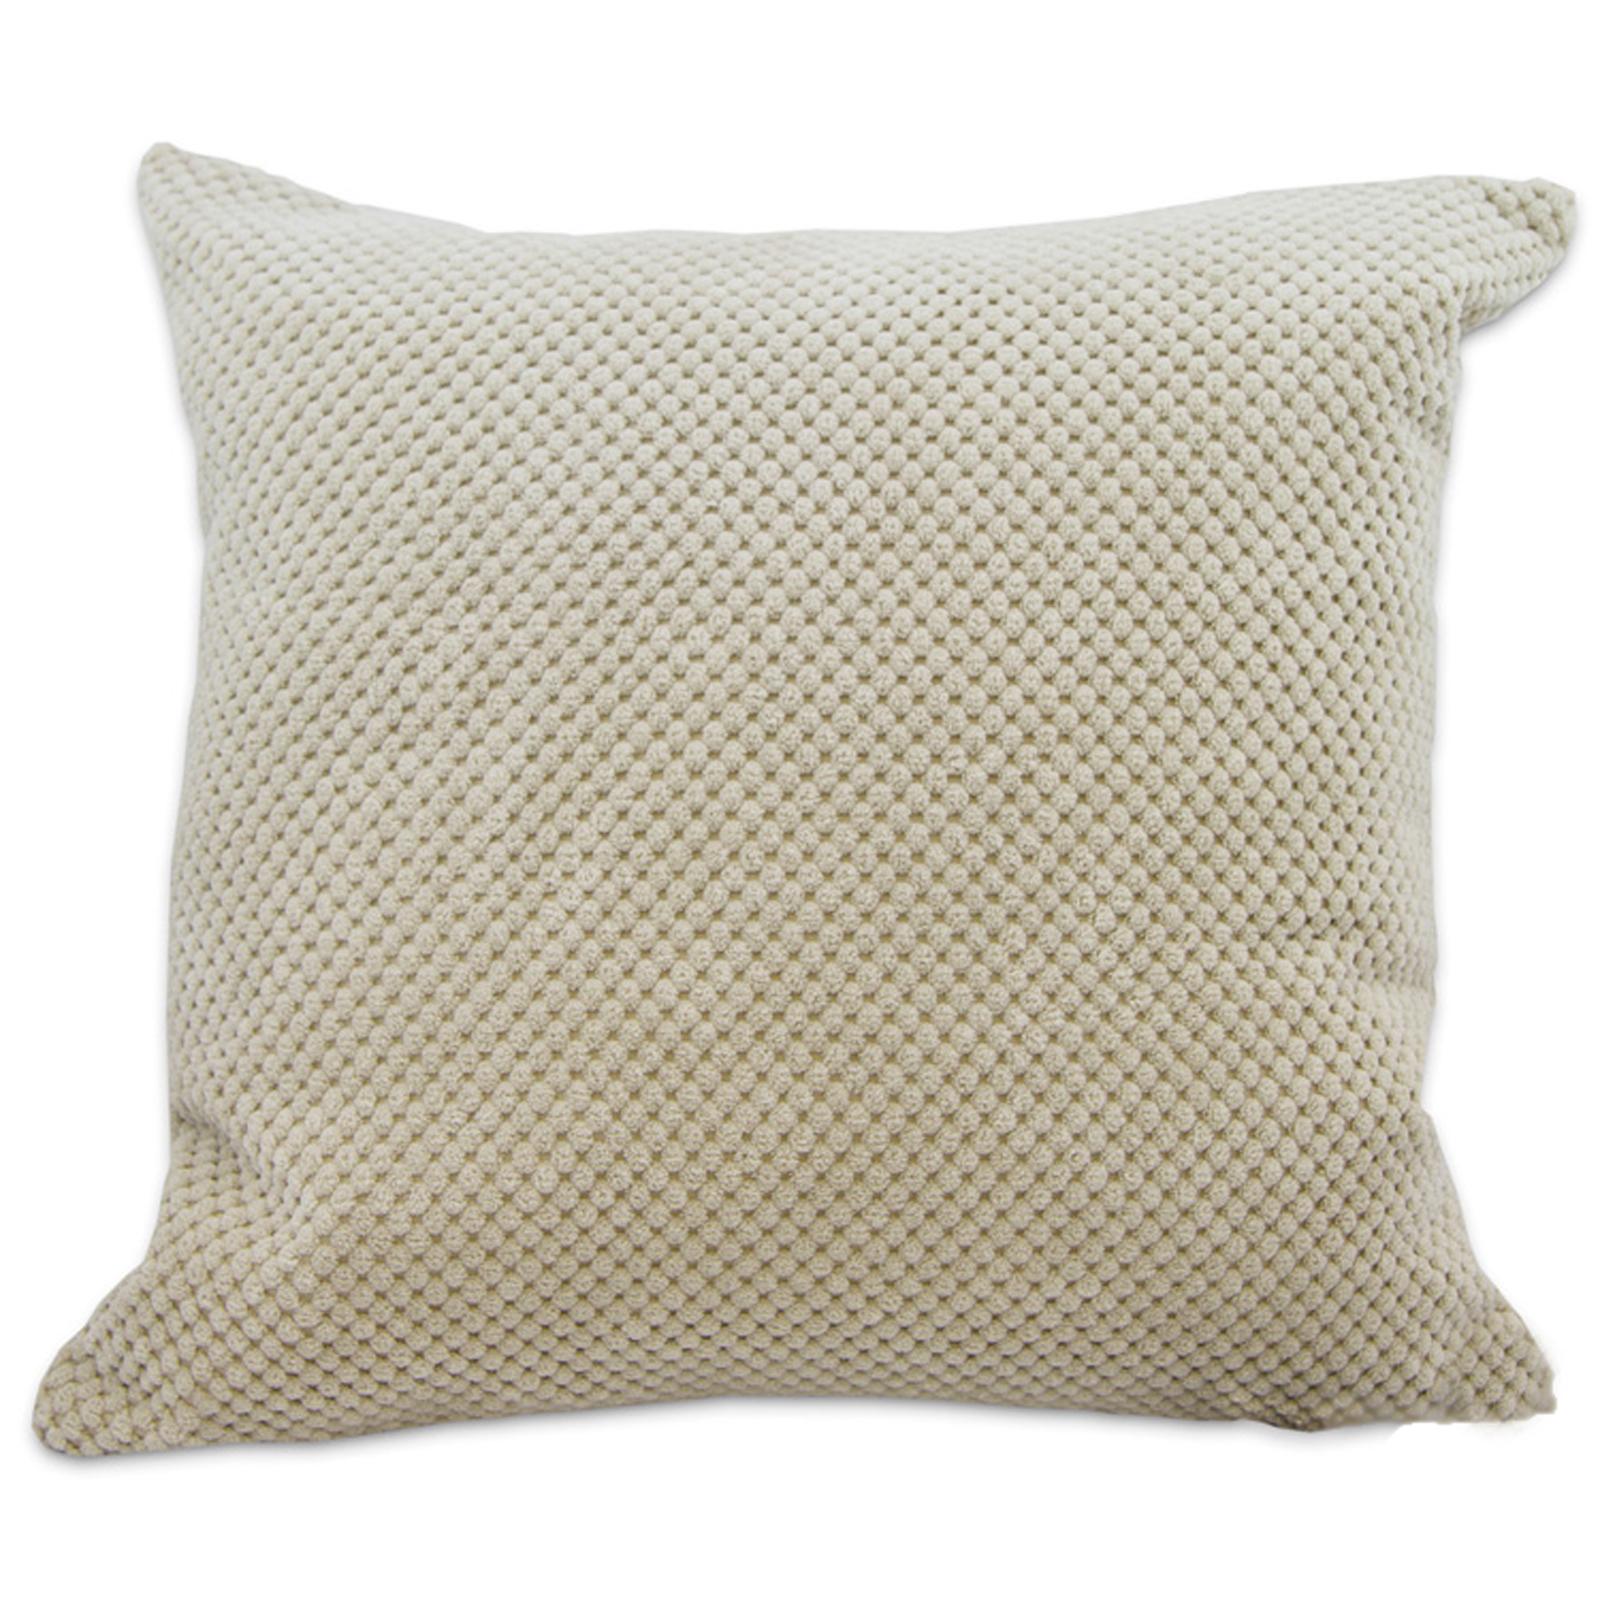 cream sofa throws uk score range chenille cushions and super soft throw blankets